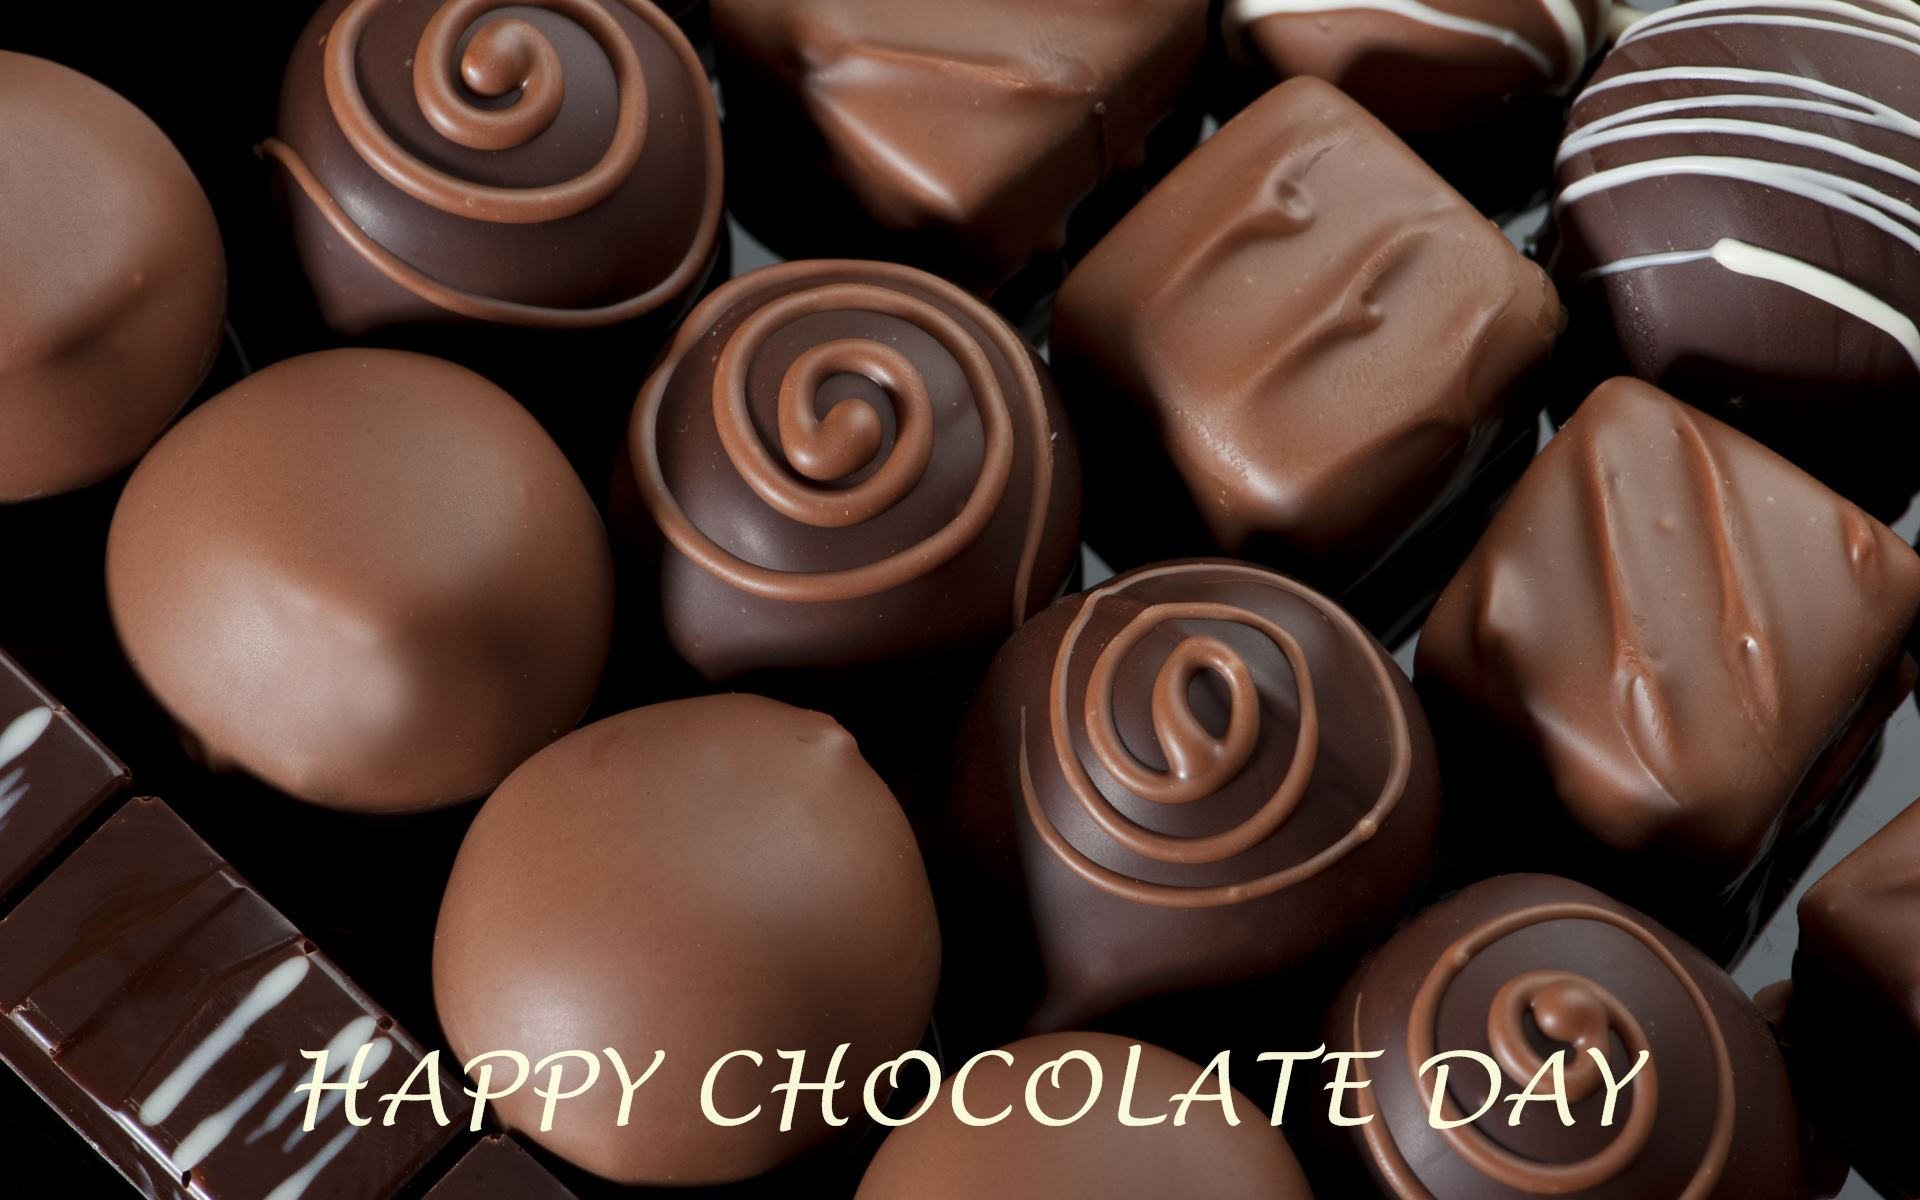 Happy Chocolate Day HD Wallpaper 05911 wallpaperspickcom 1920x1200